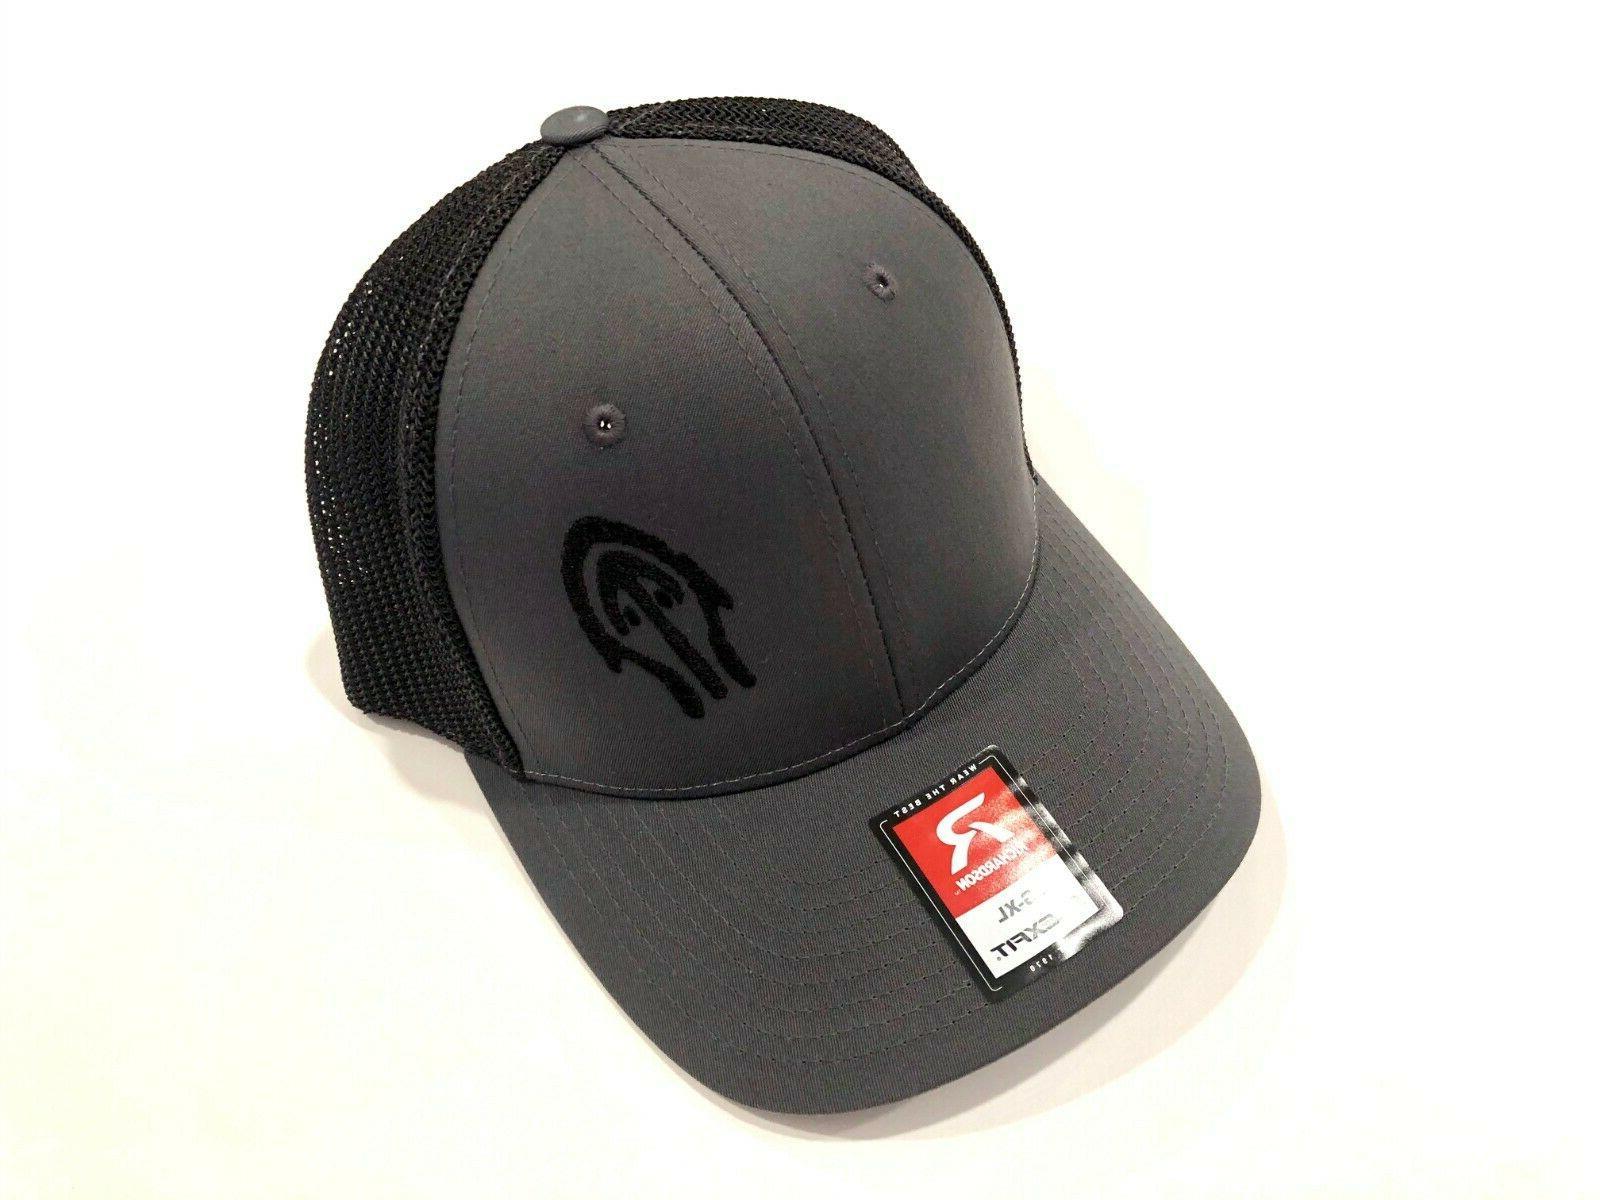 new hat world s leading fishing